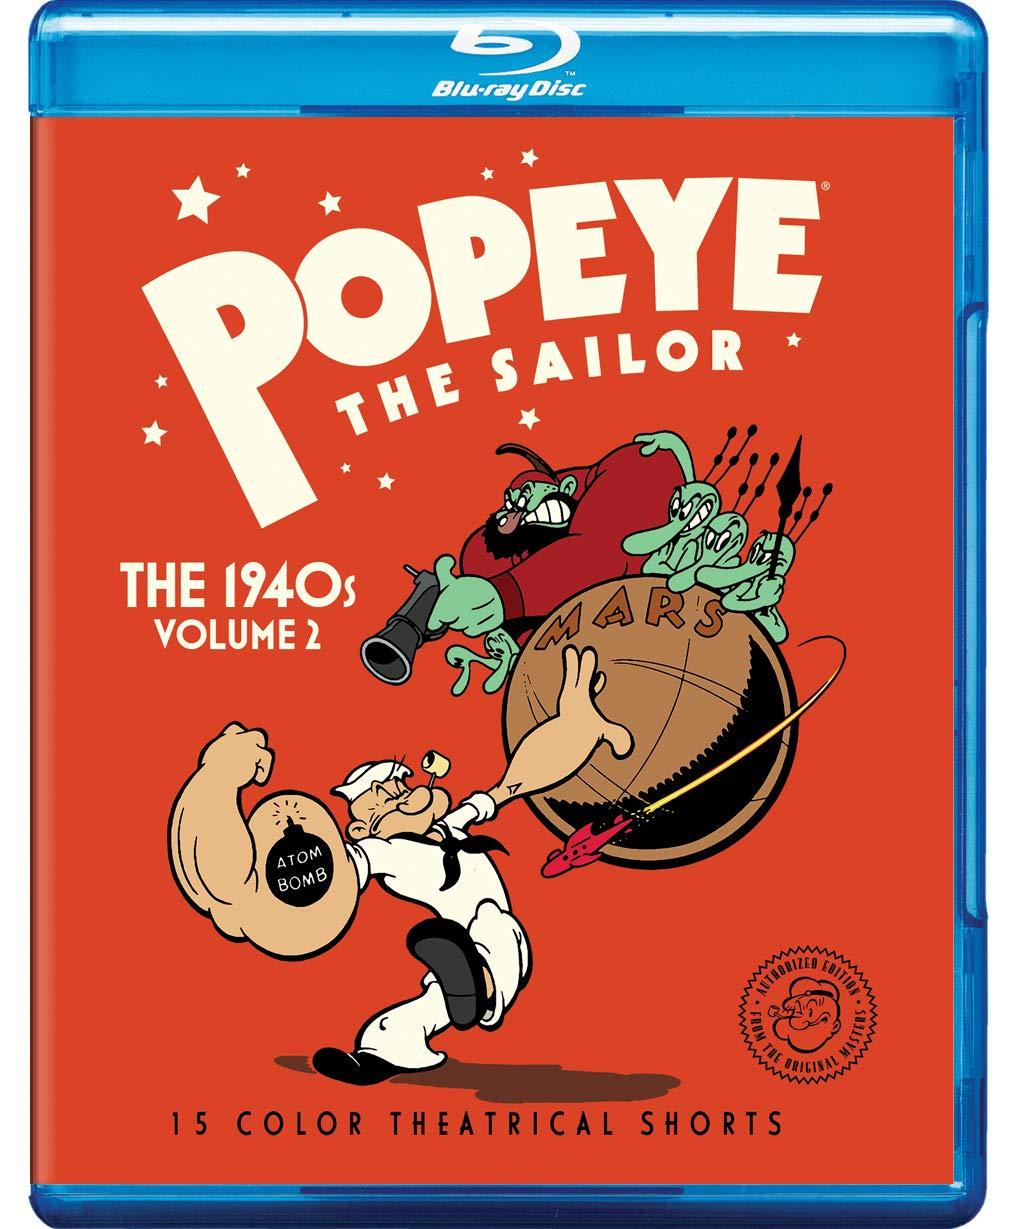 Popeye the Sailor The 1940s Volume 2 1080p BluRay REMUX AVC DTS-HD MA 2.0-EPSiLON | 27 GB |